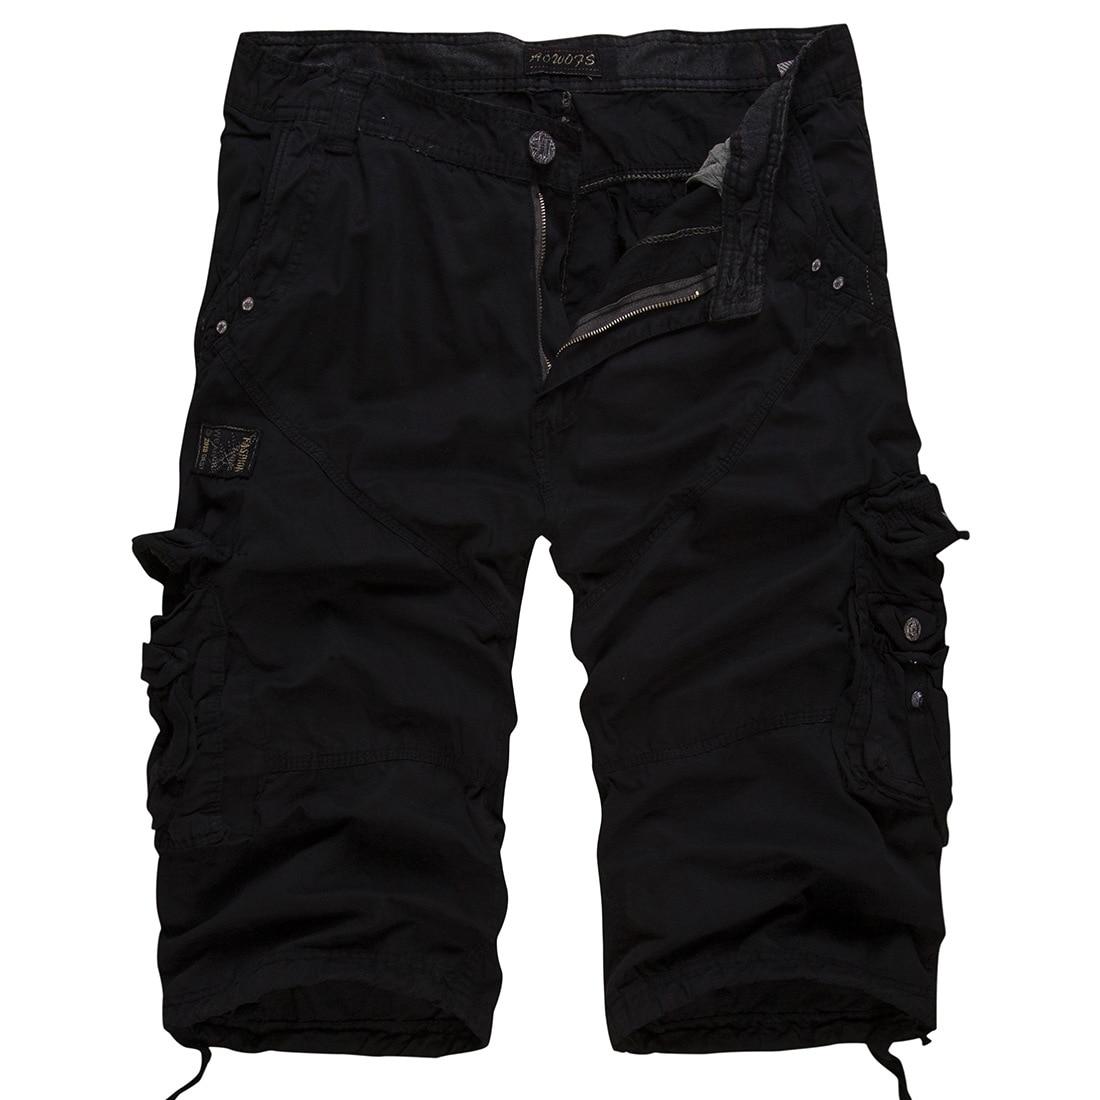 Shorts Men Cool Camouflage Summer Hot Sale Cotton Casual Men Short Pants Brand Clothing Comfortable Camo Men Cargo Shorts K5822